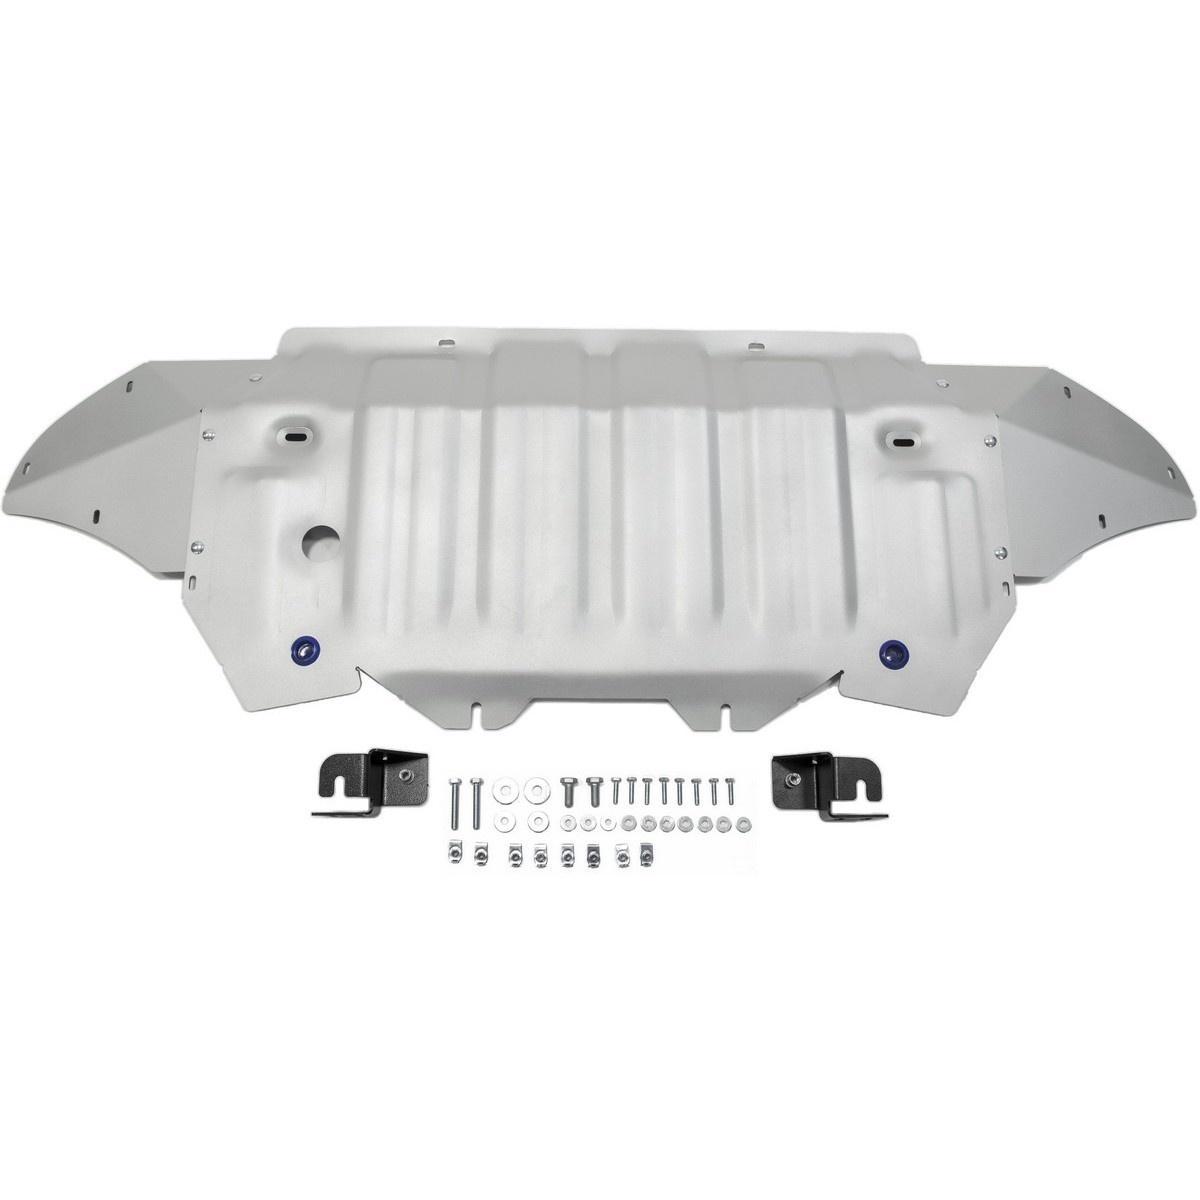 Защита радиатора Rival 333.0329.12200000006462Защита радиатора и картера Rival 333.0329.1 для Audi Q7